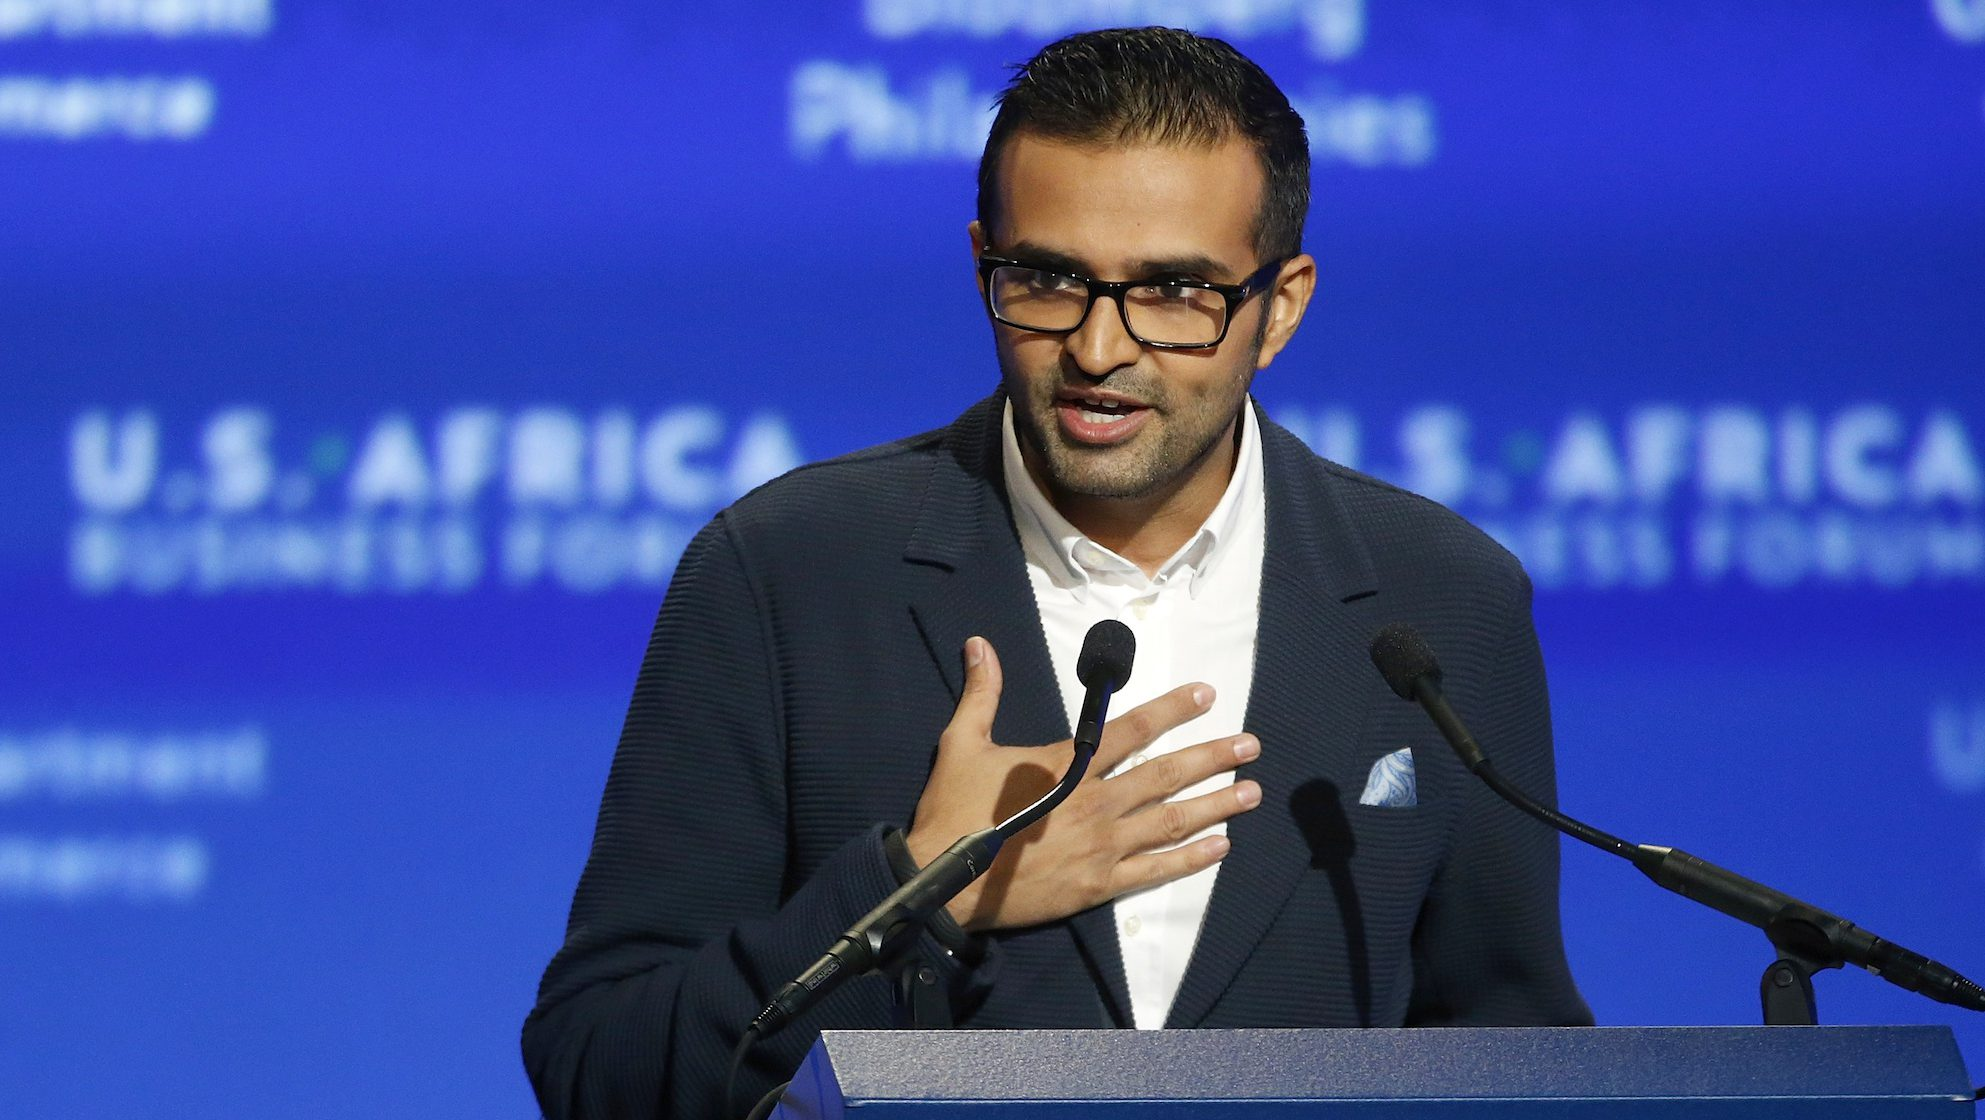 Mara Group Founder and Managing Director Thakkar addresses the U.S.-Africa Business Forum in Washington